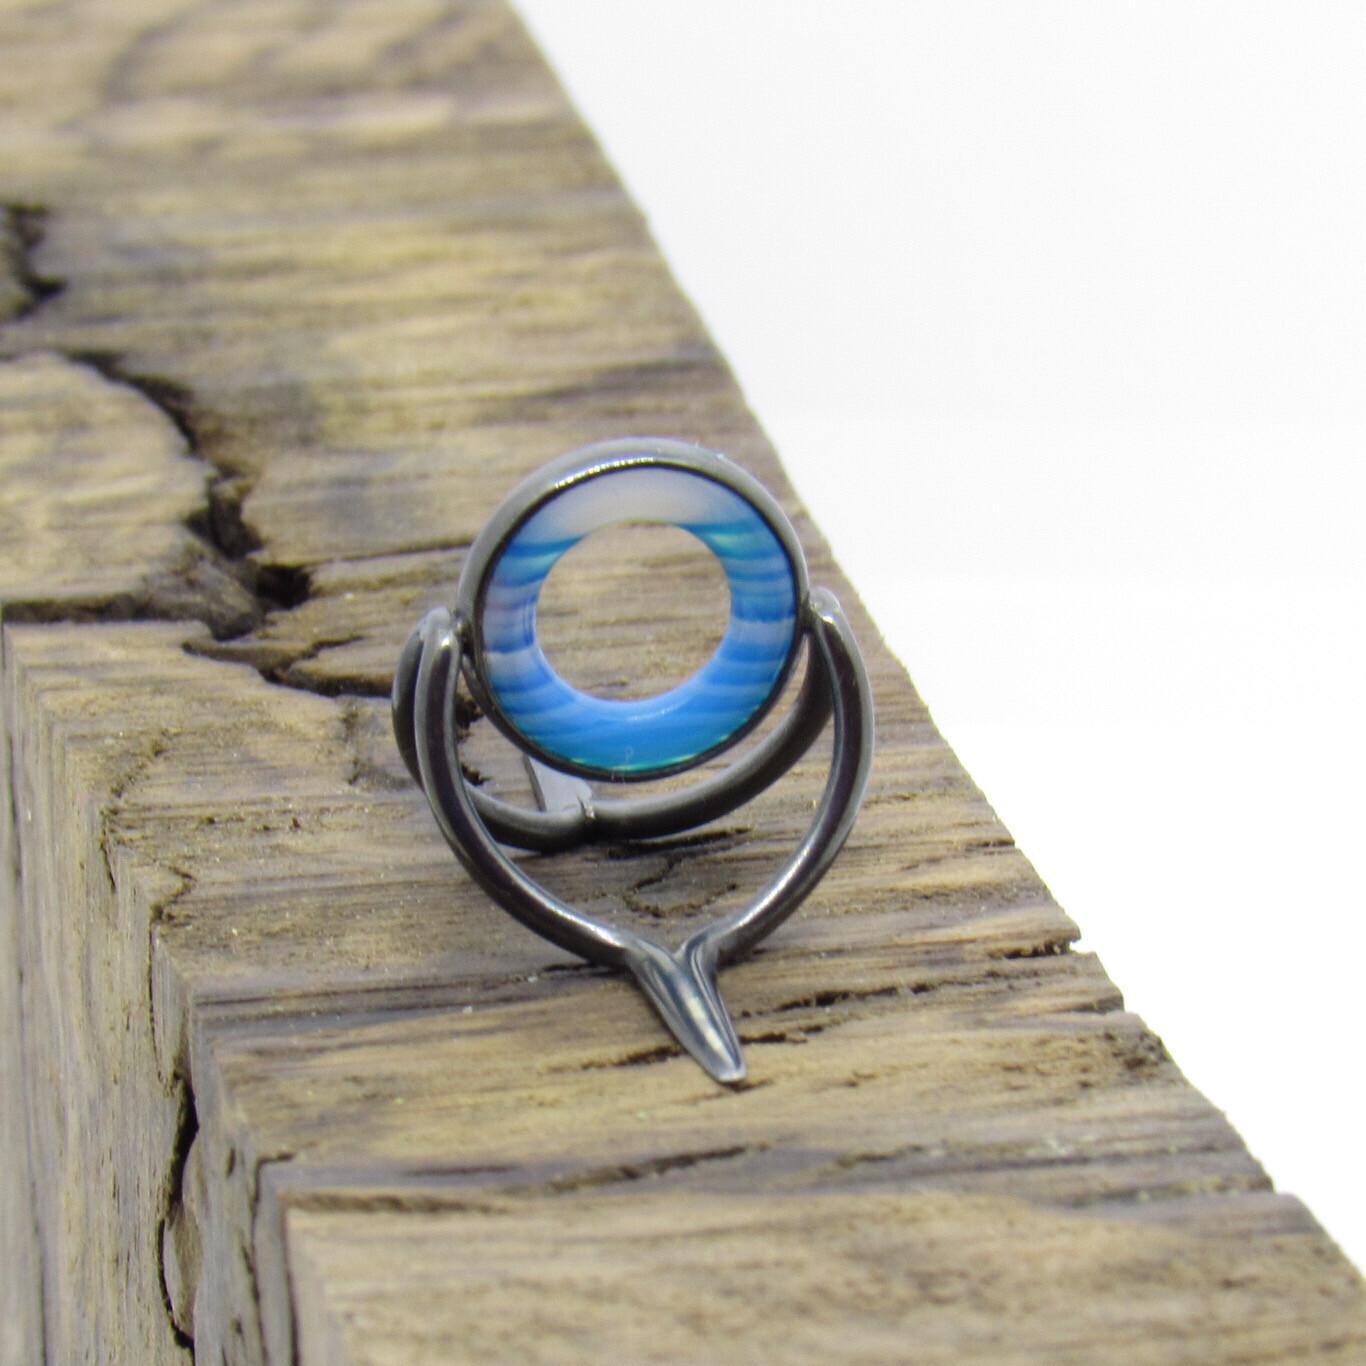 Agate Perfect Stripping Guide 10mm blau weiss silber brüniert